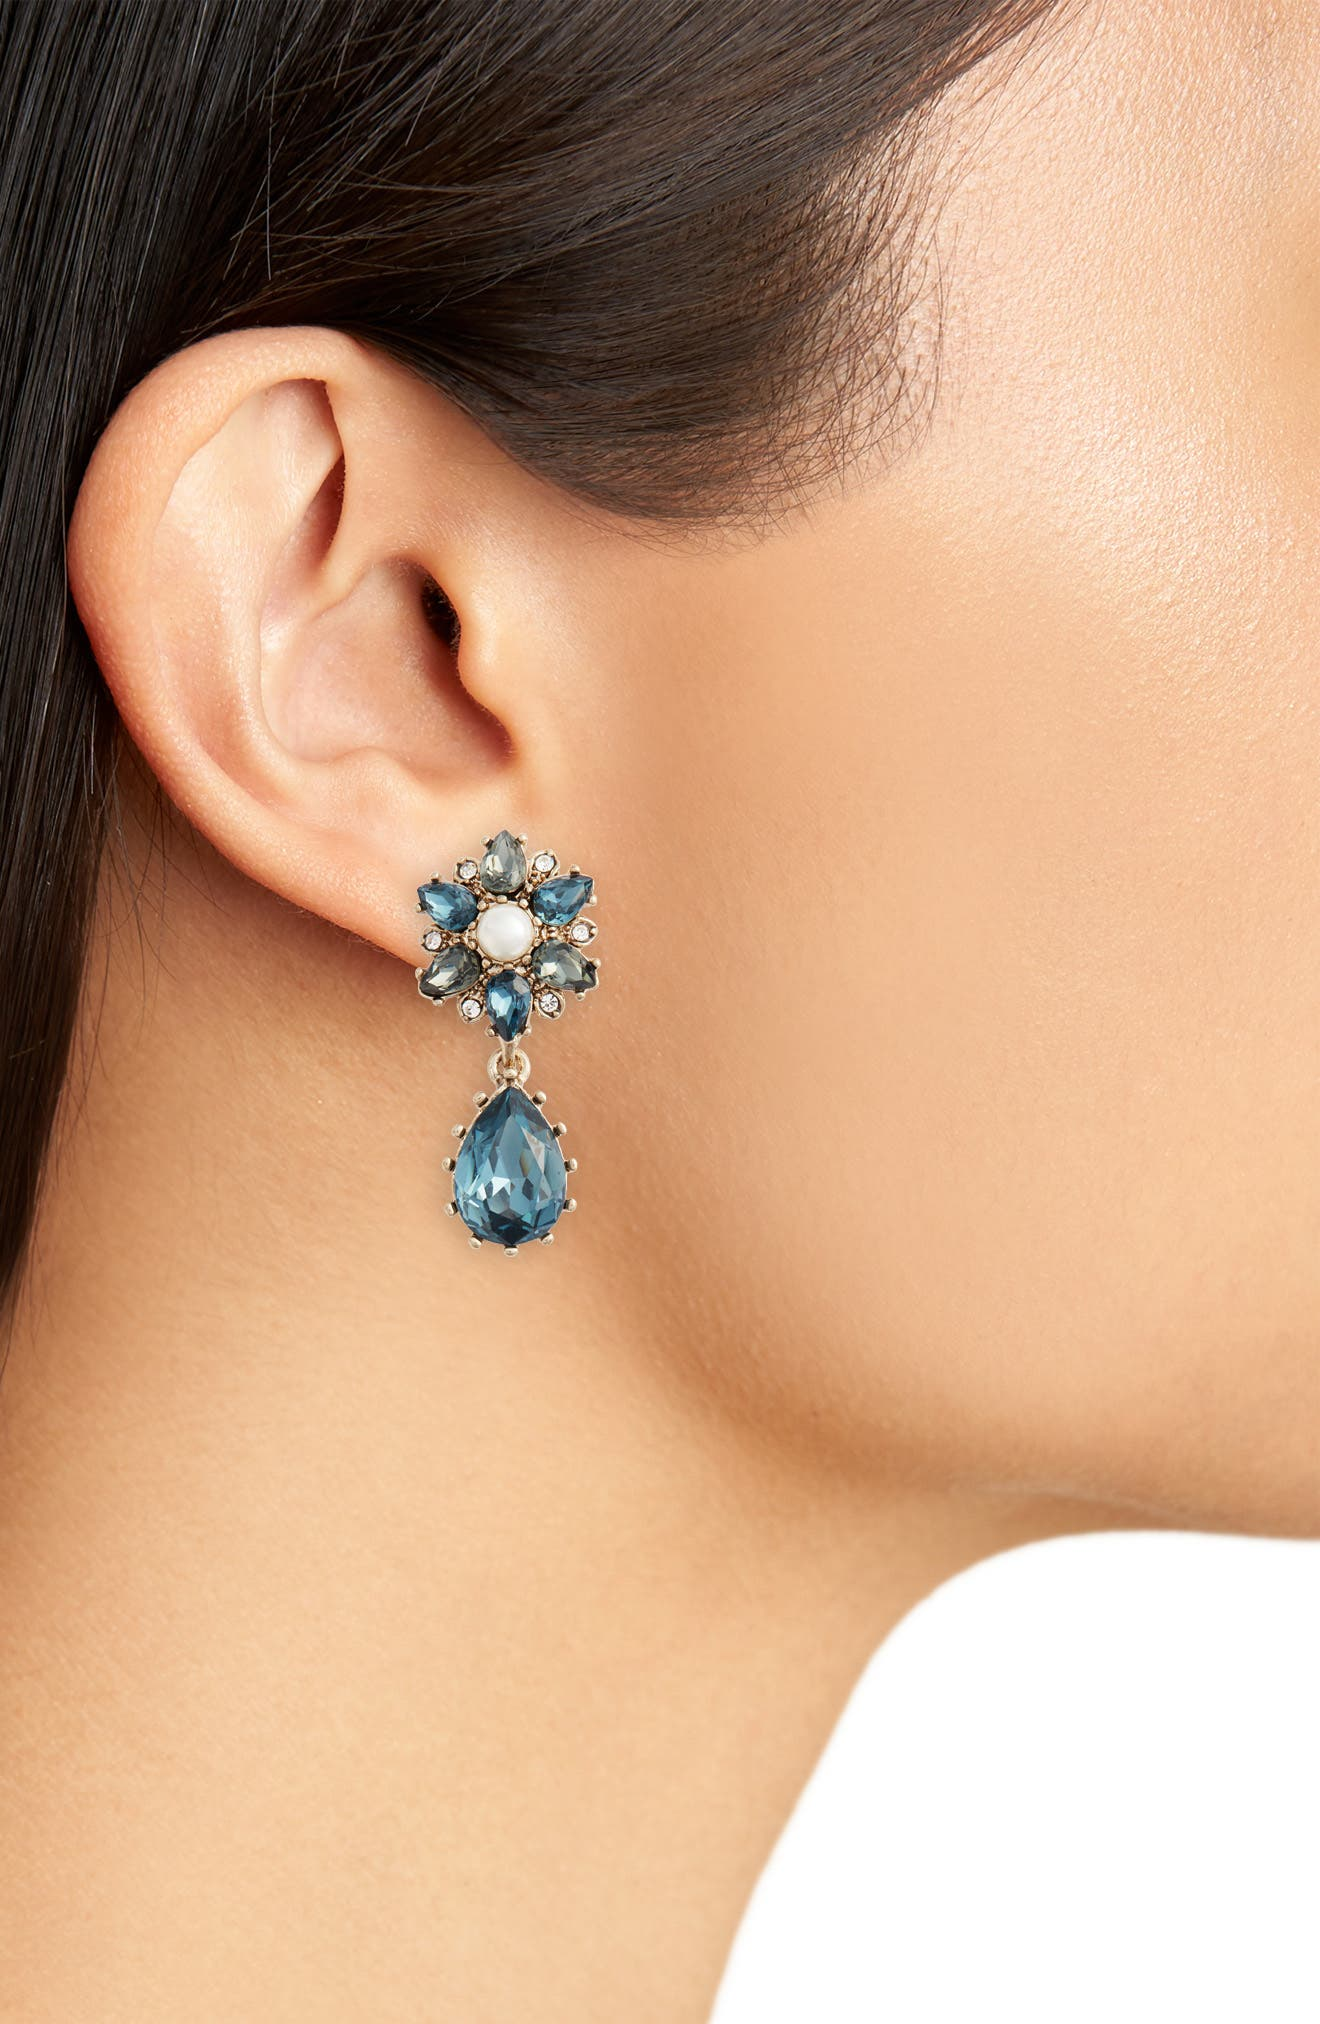 MARCHESA, Double Drop Earrings, Alternate thumbnail 2, color, 400